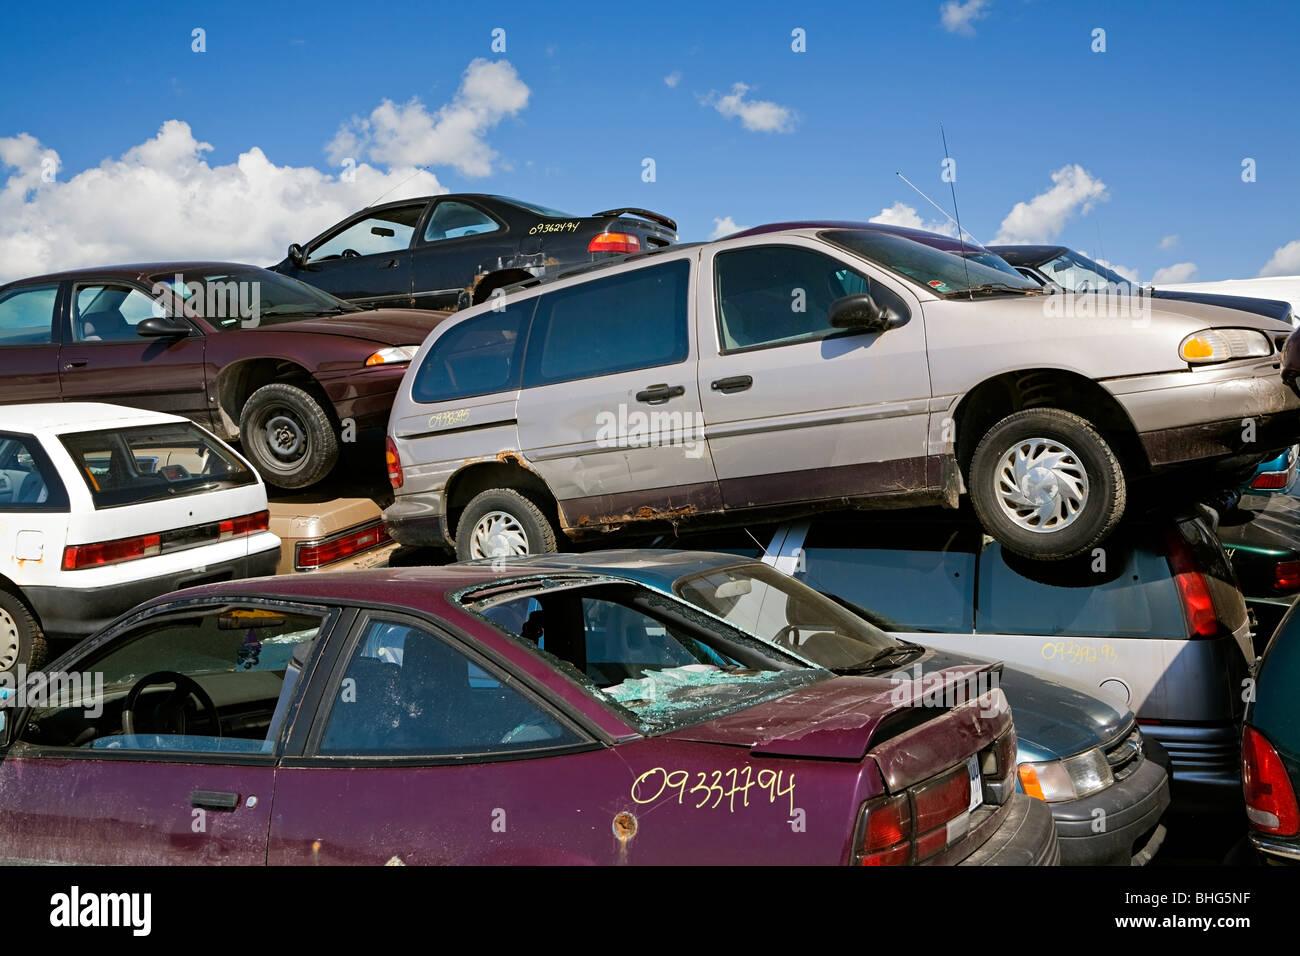 Autos auf Schrottplatz Stockbild